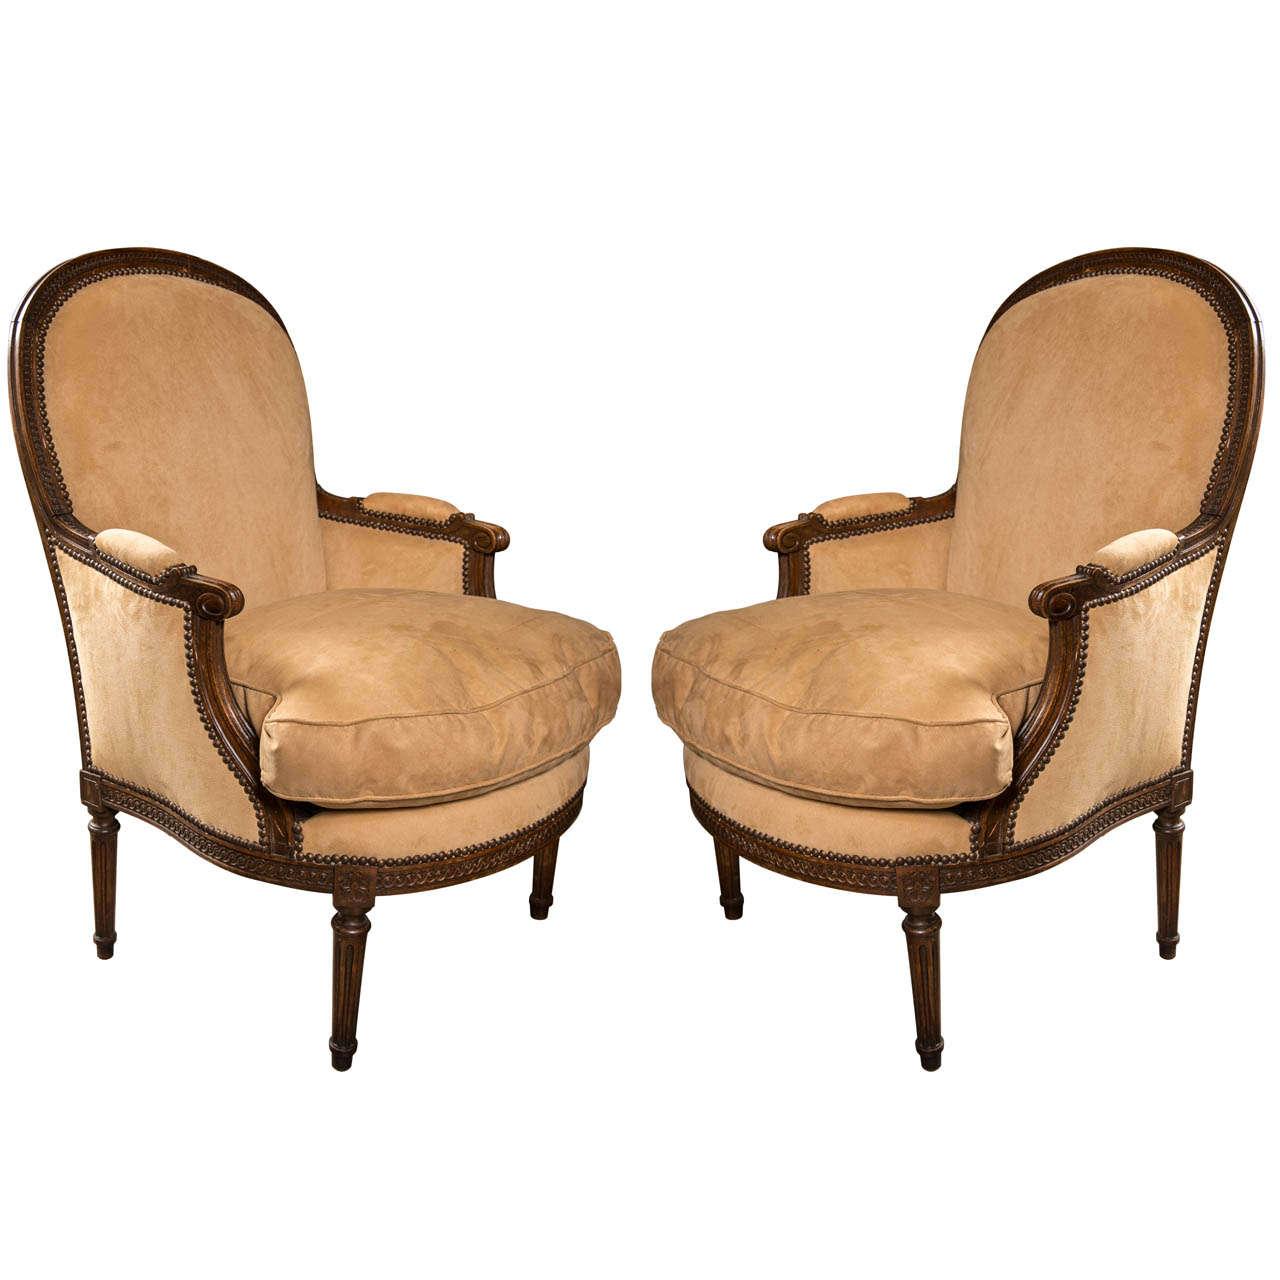 Pair Bergeres in the Louis XVI Style